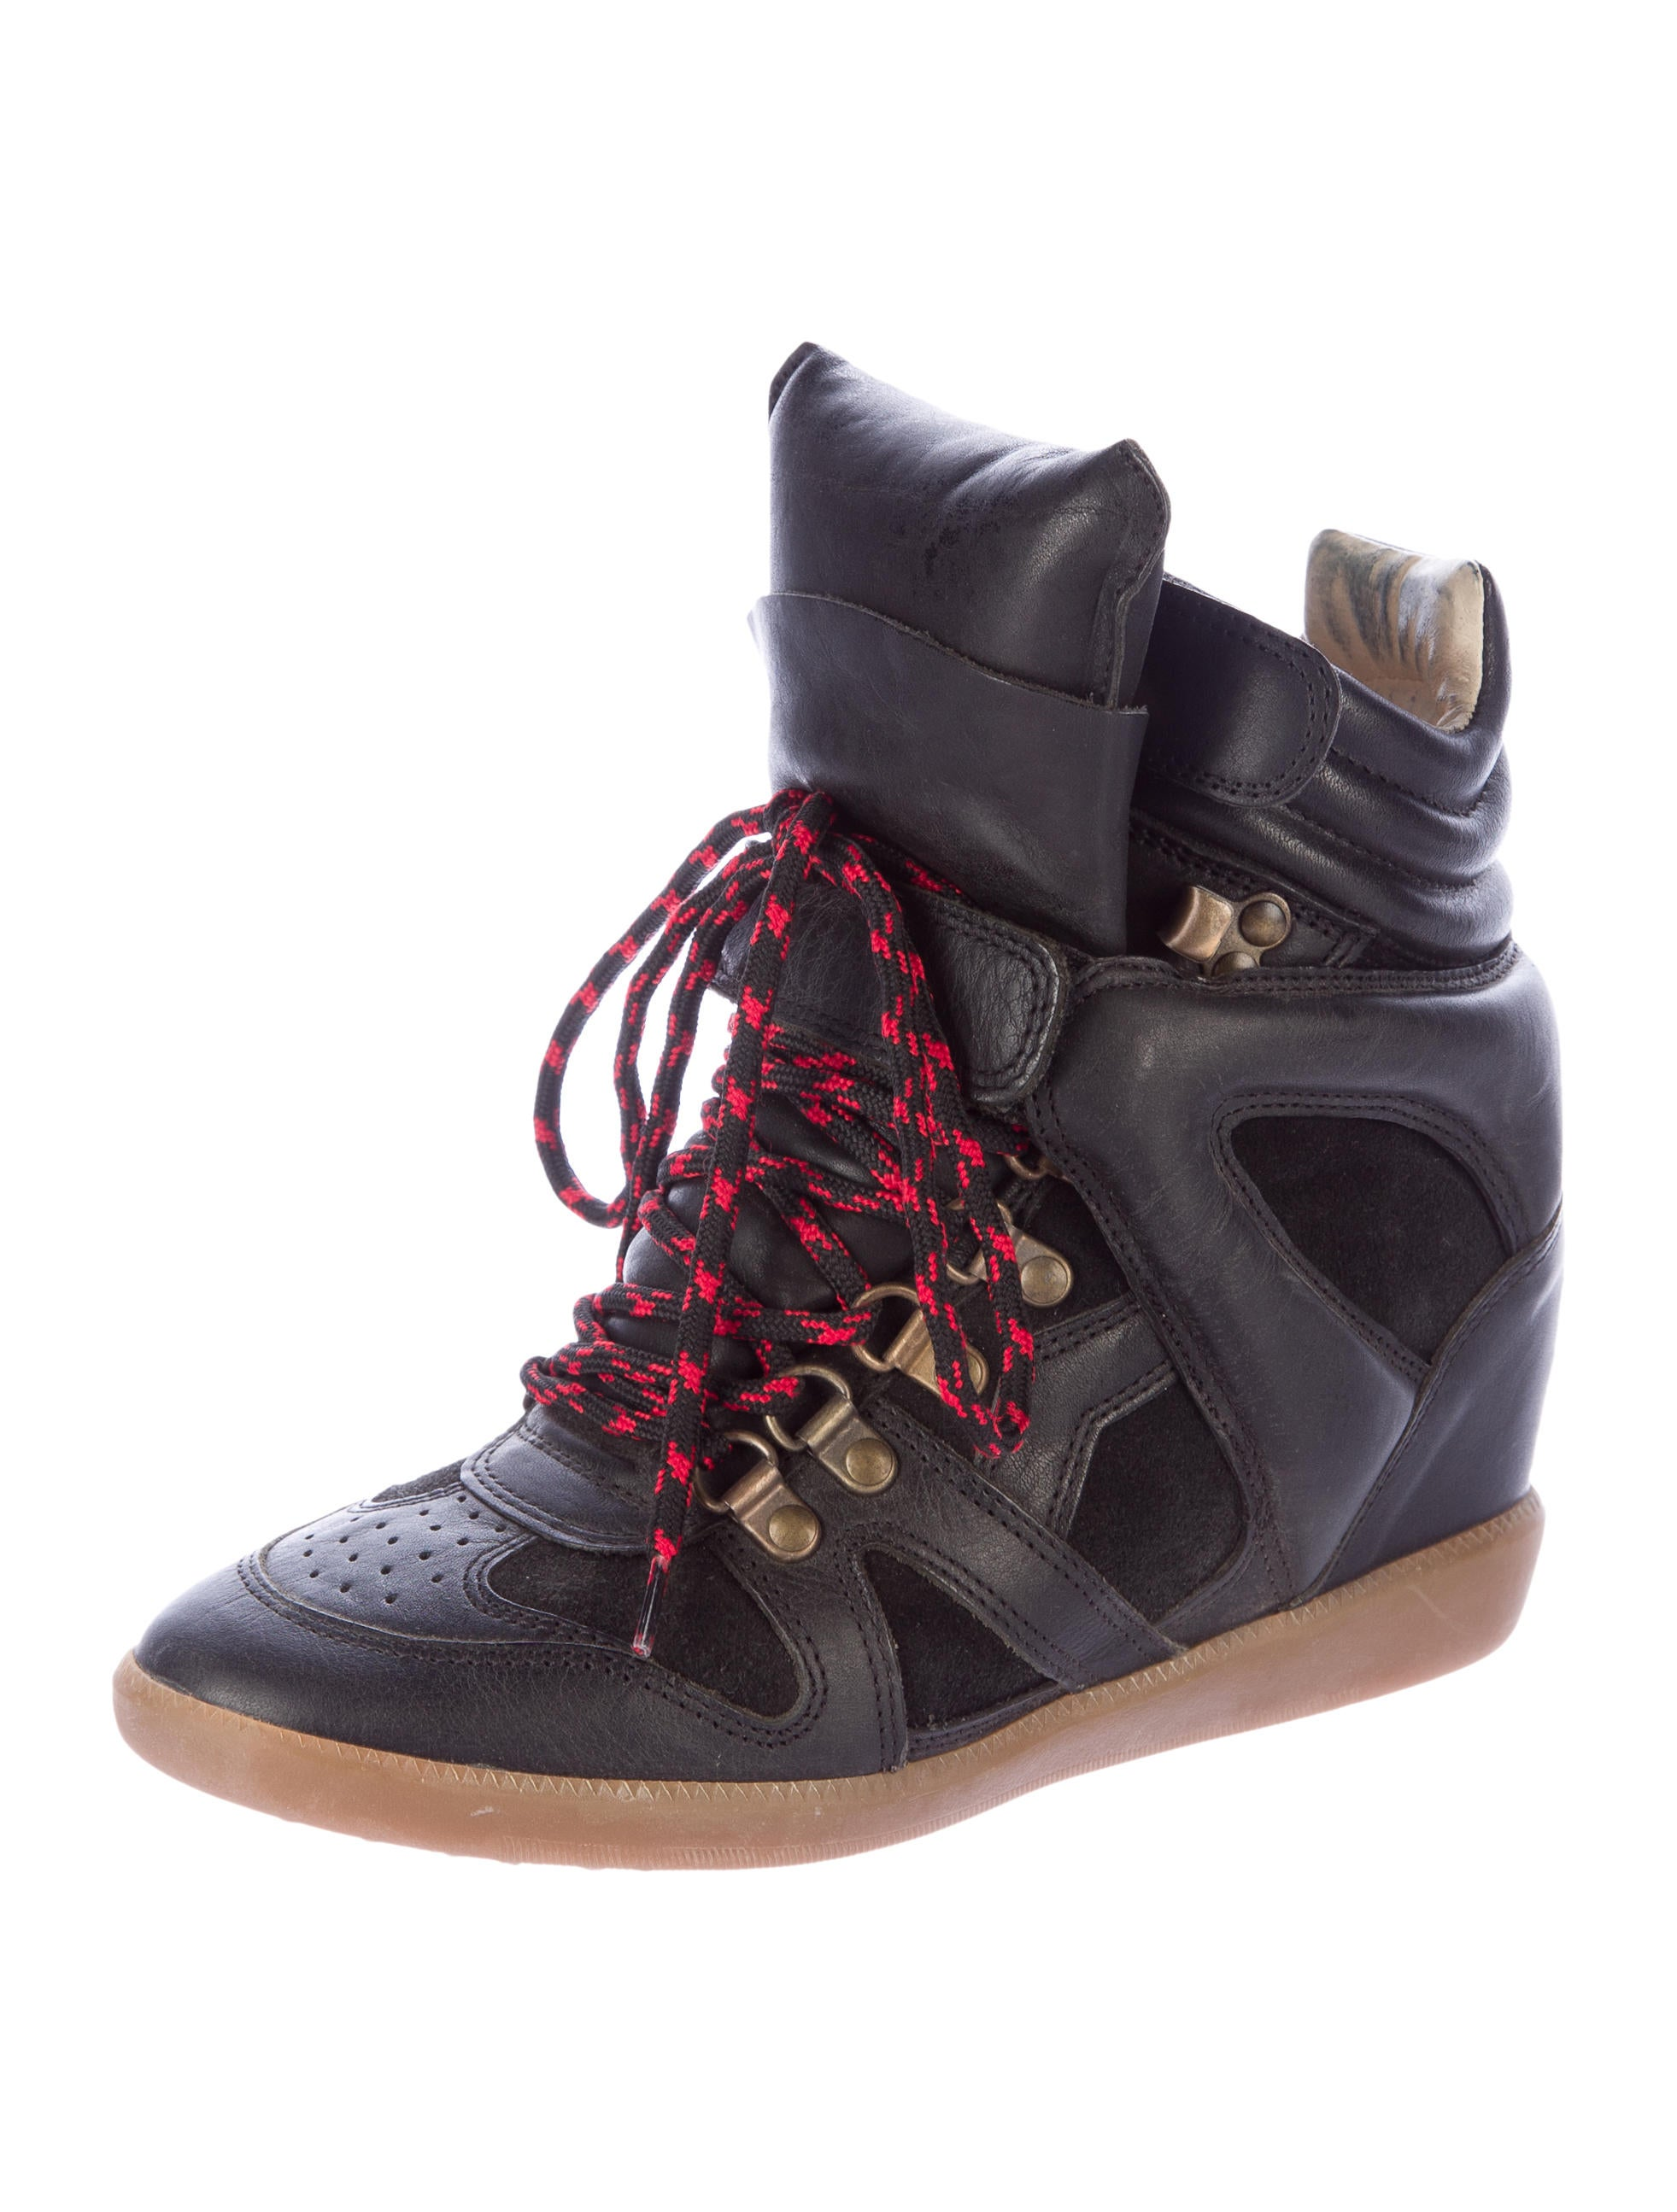 shop for sale online factory outlet online Isabel Marant Tibetan High-Top Sneakers Y4FlWE